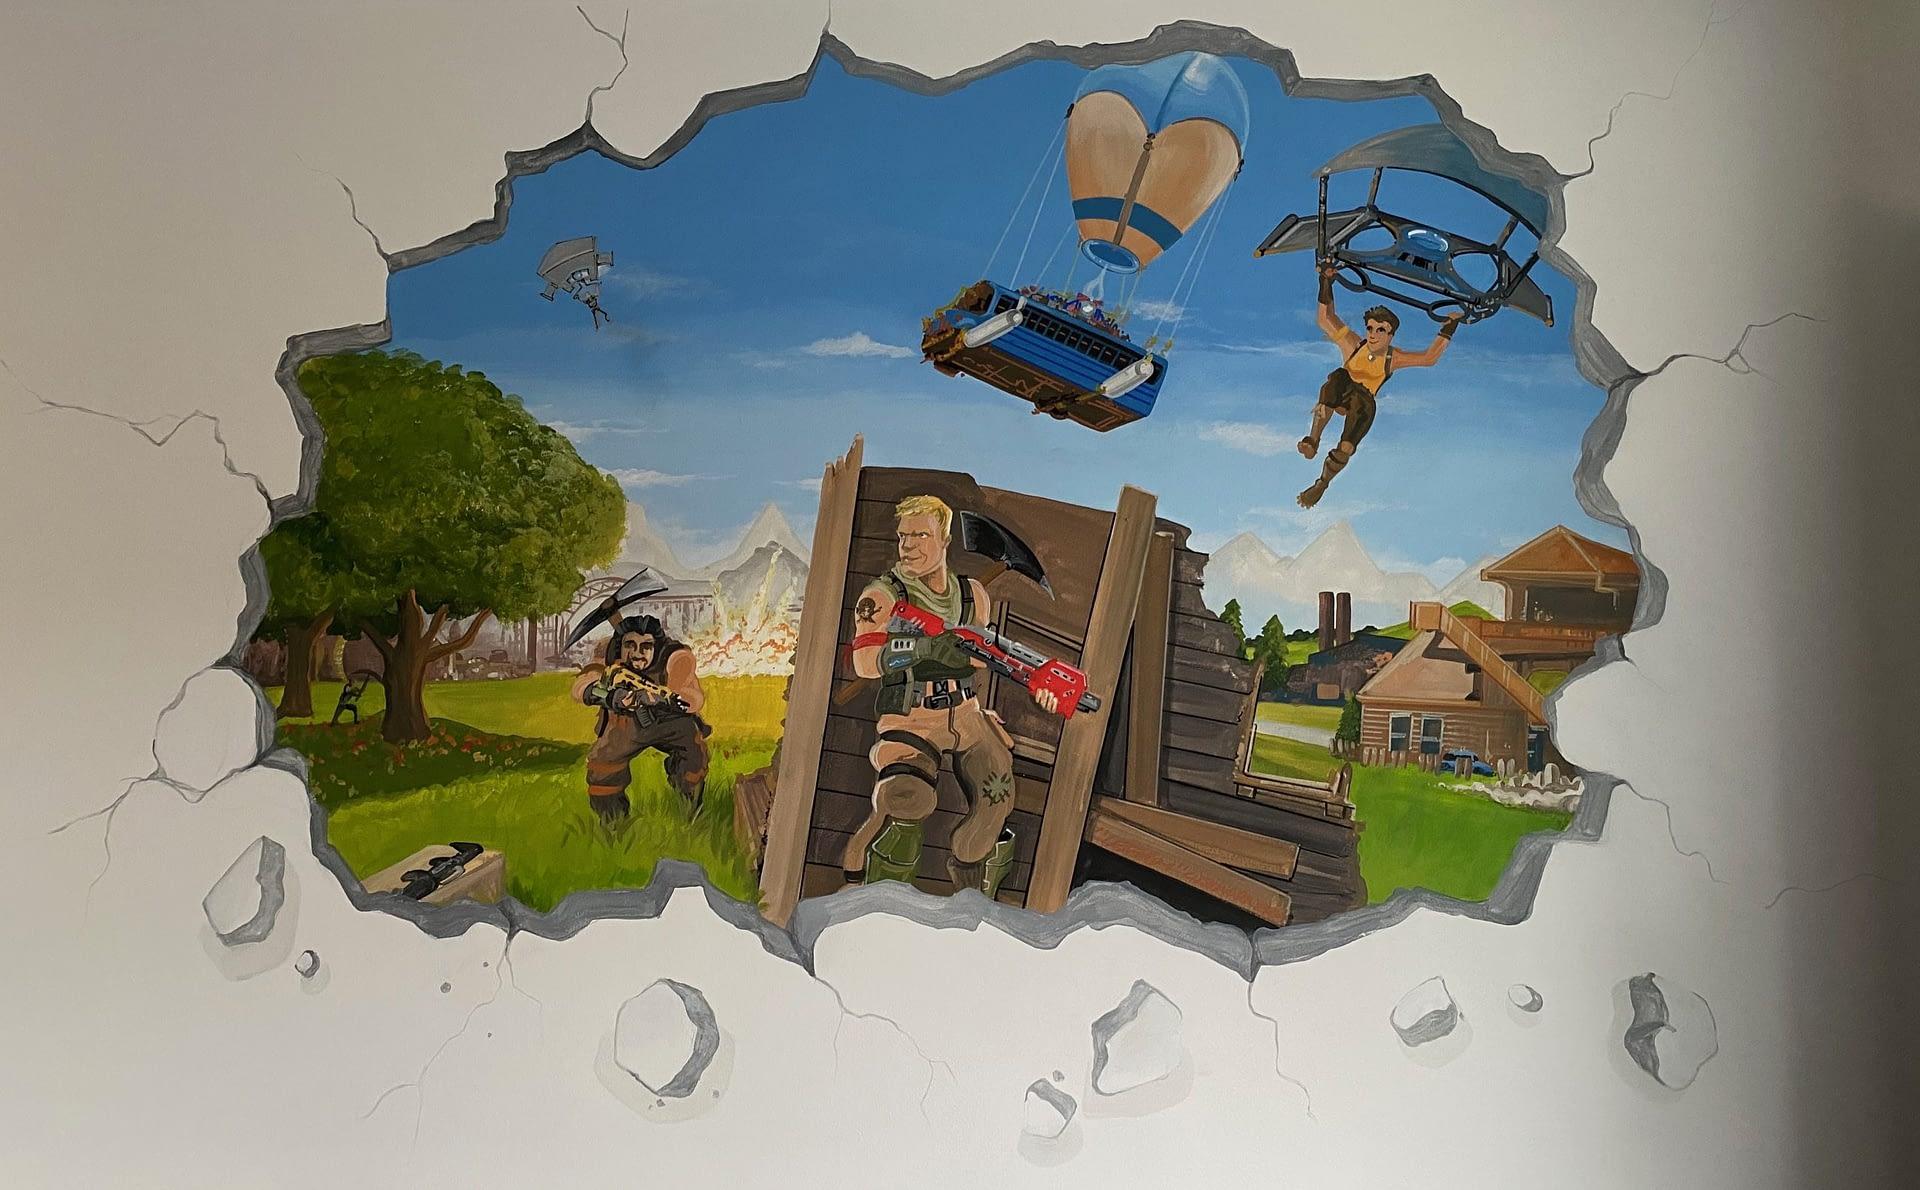 Fortnite Mural